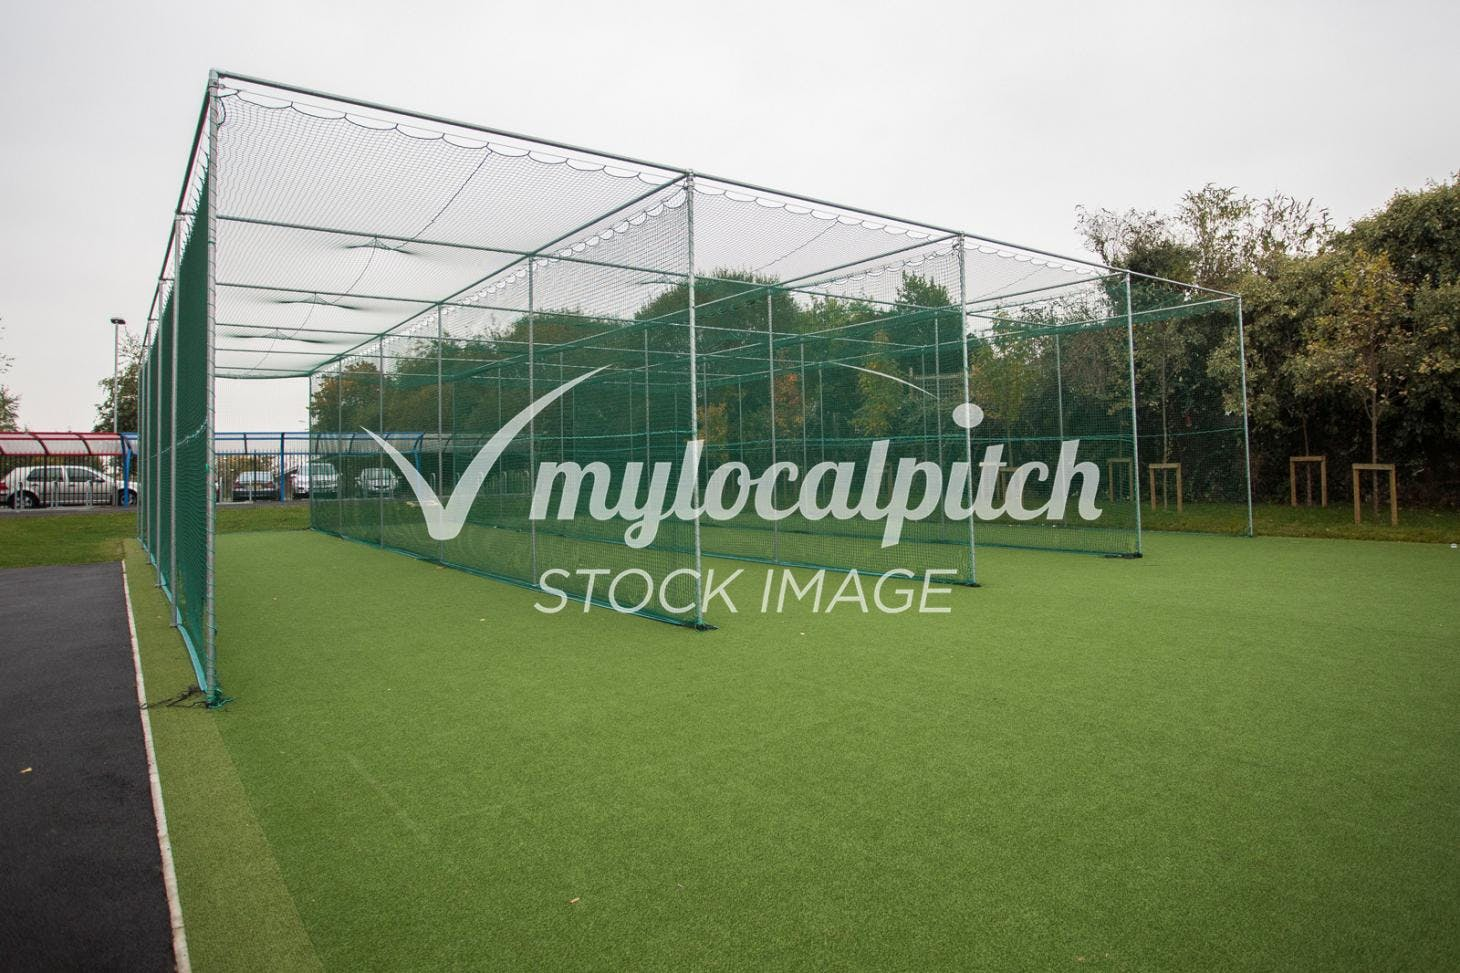 Sir Francis Barker Recreation Ground Nets | Artificial cricket facilities